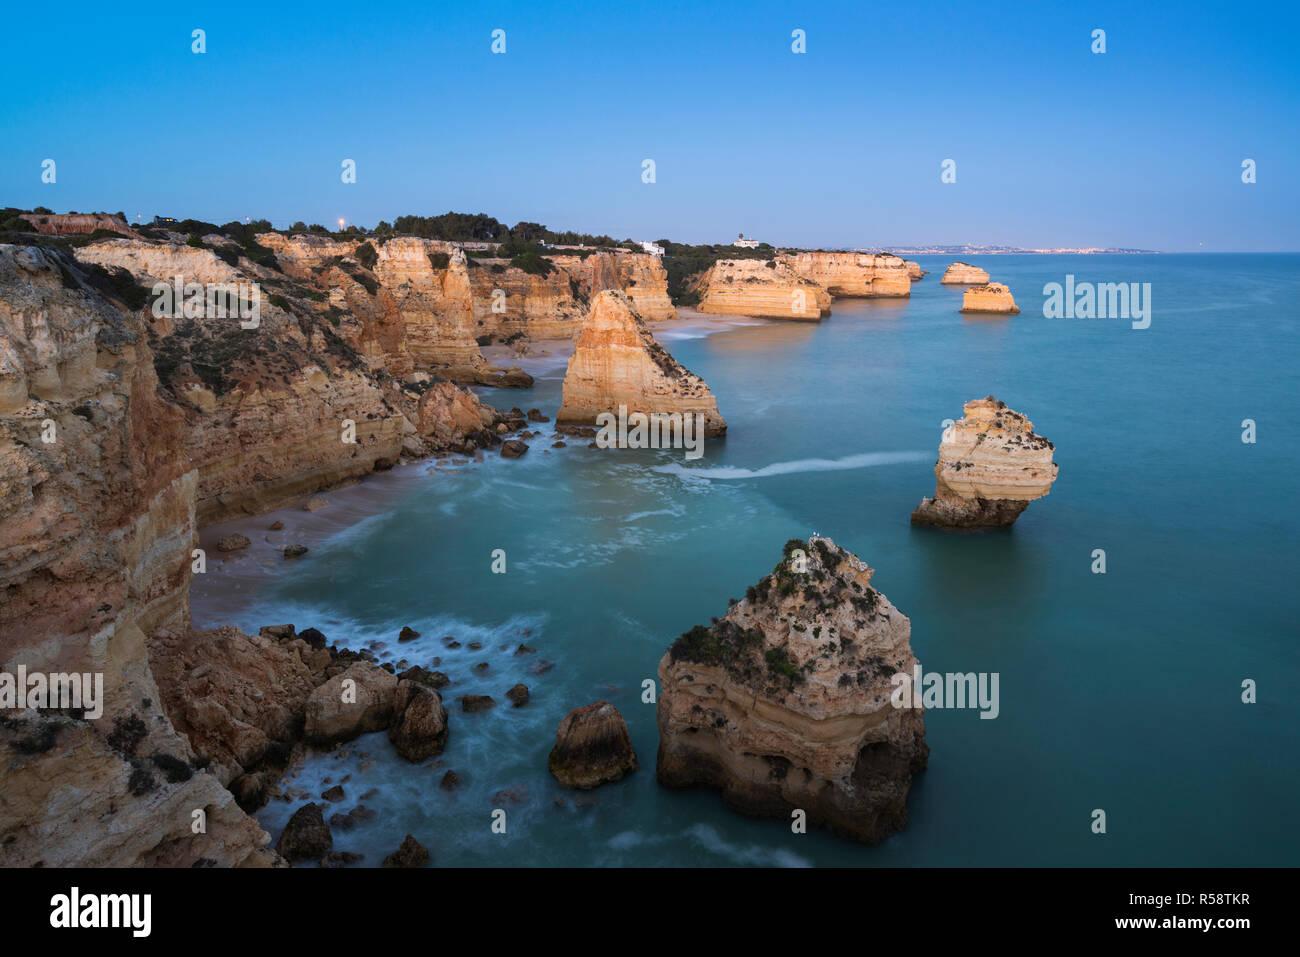 Praia da Marinha, à la lumière du matin, Lagoa, Algarve, Portugal Banque D'Images